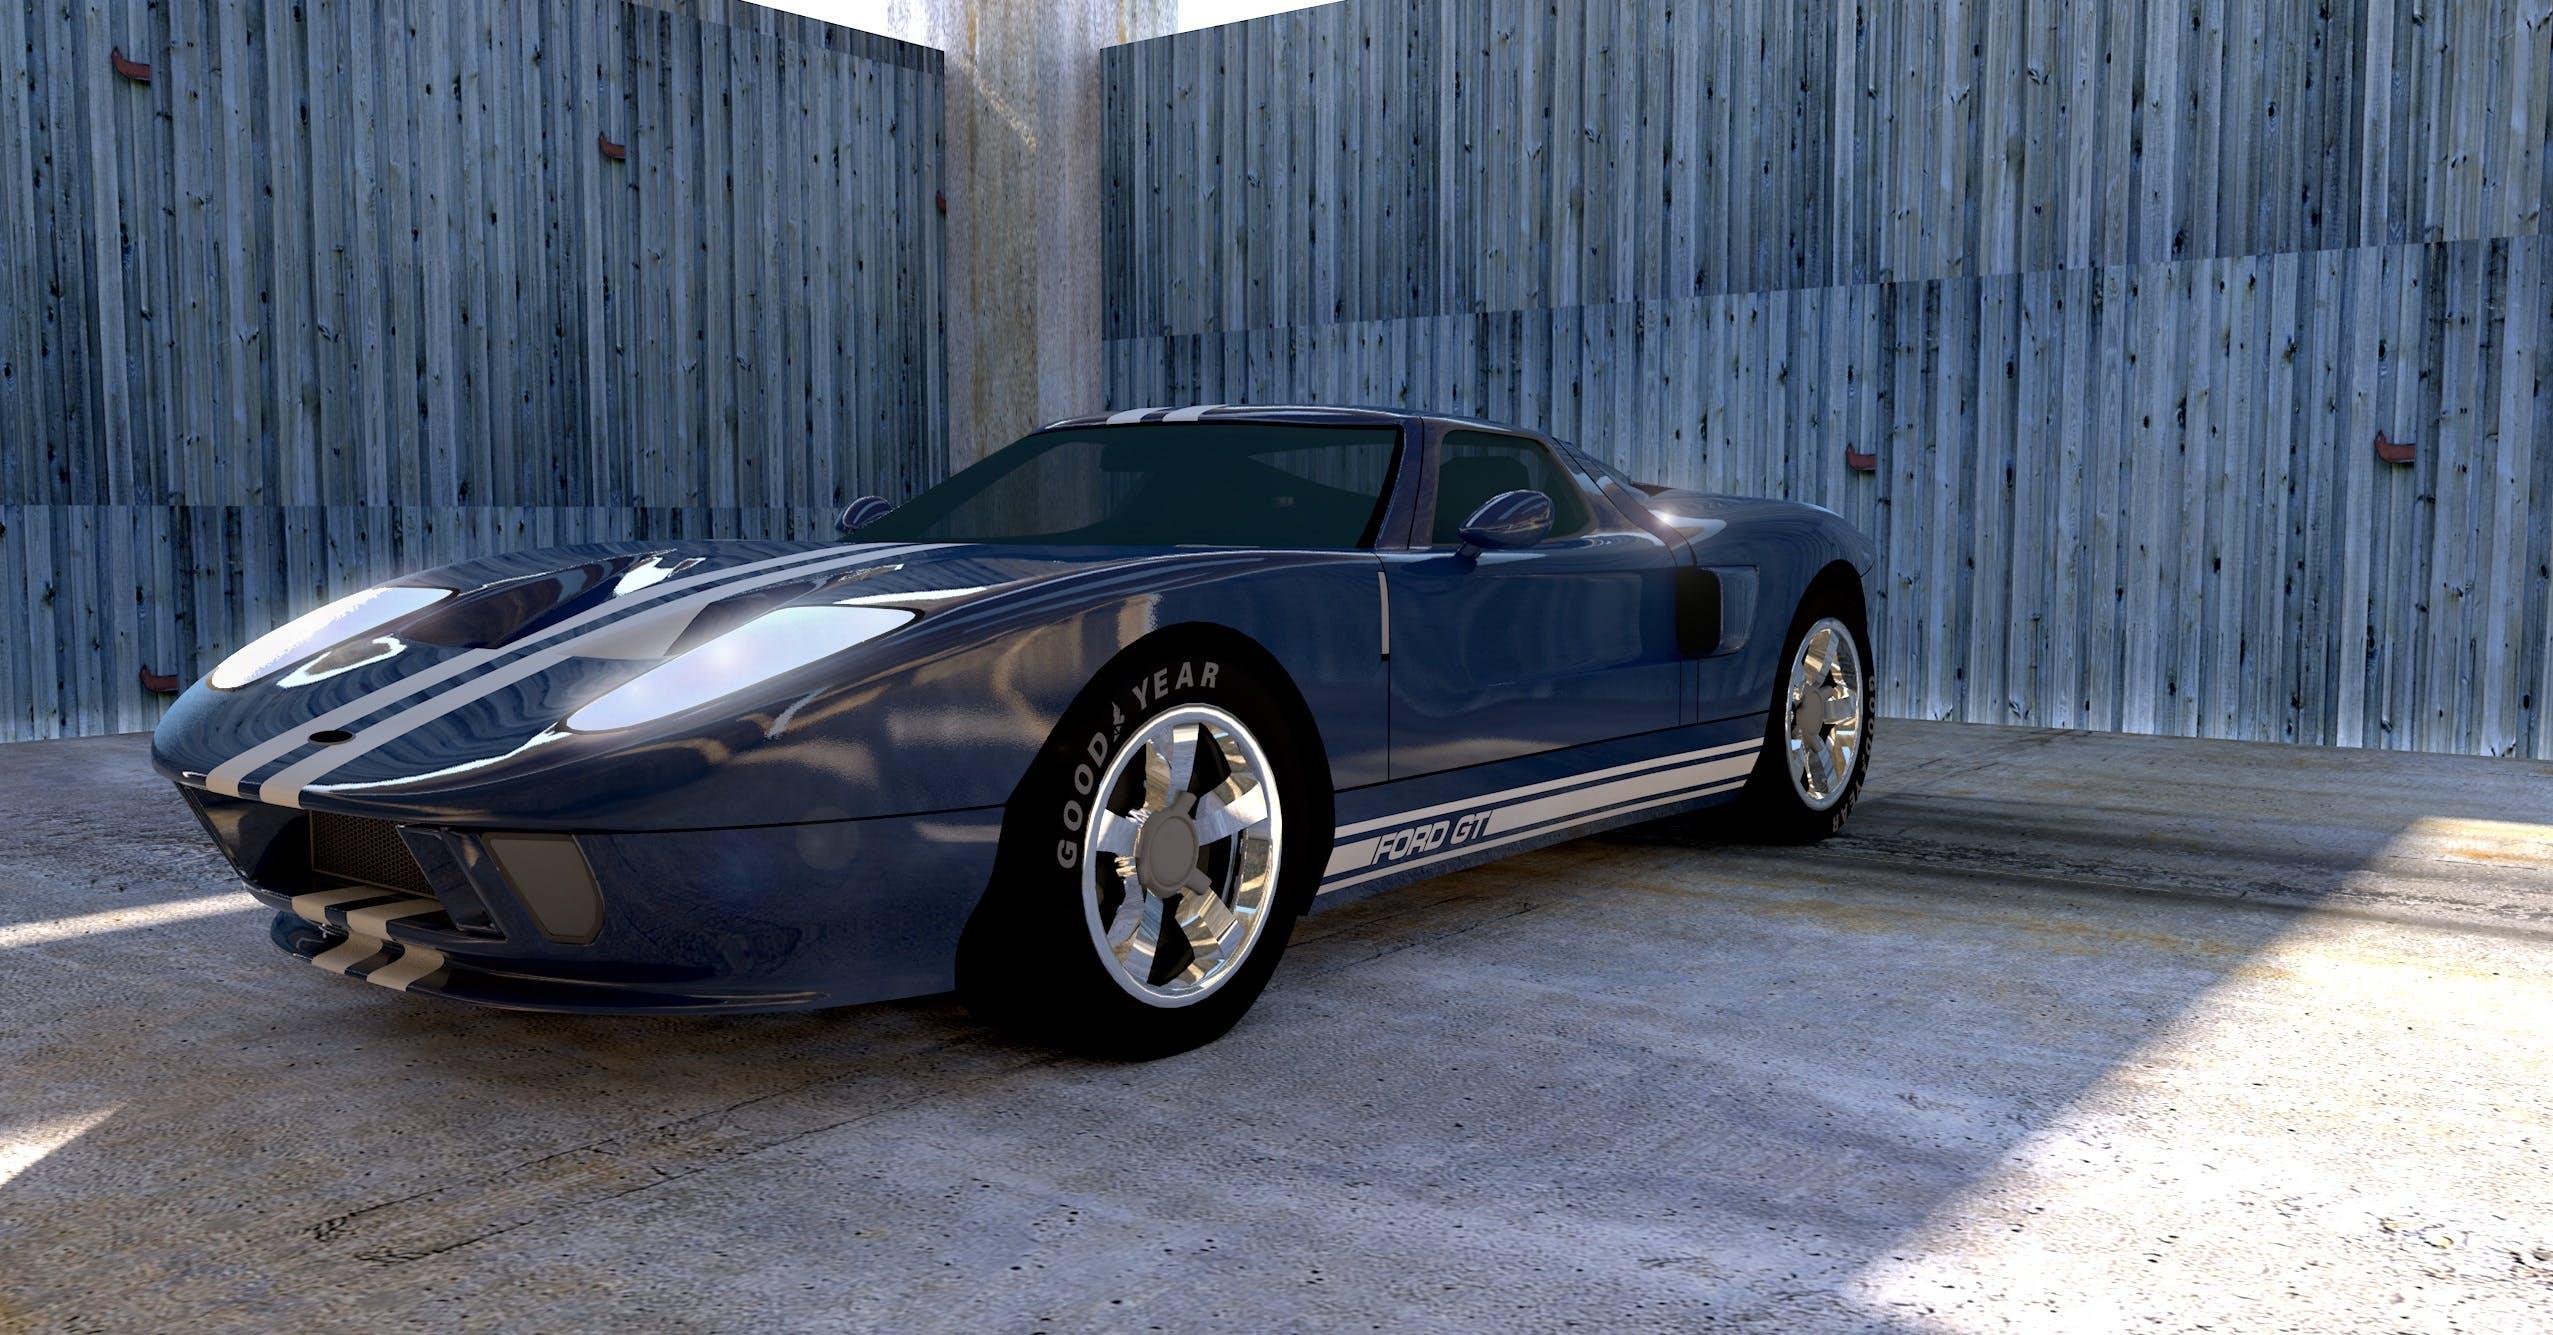 Blue Sport Car in Garage